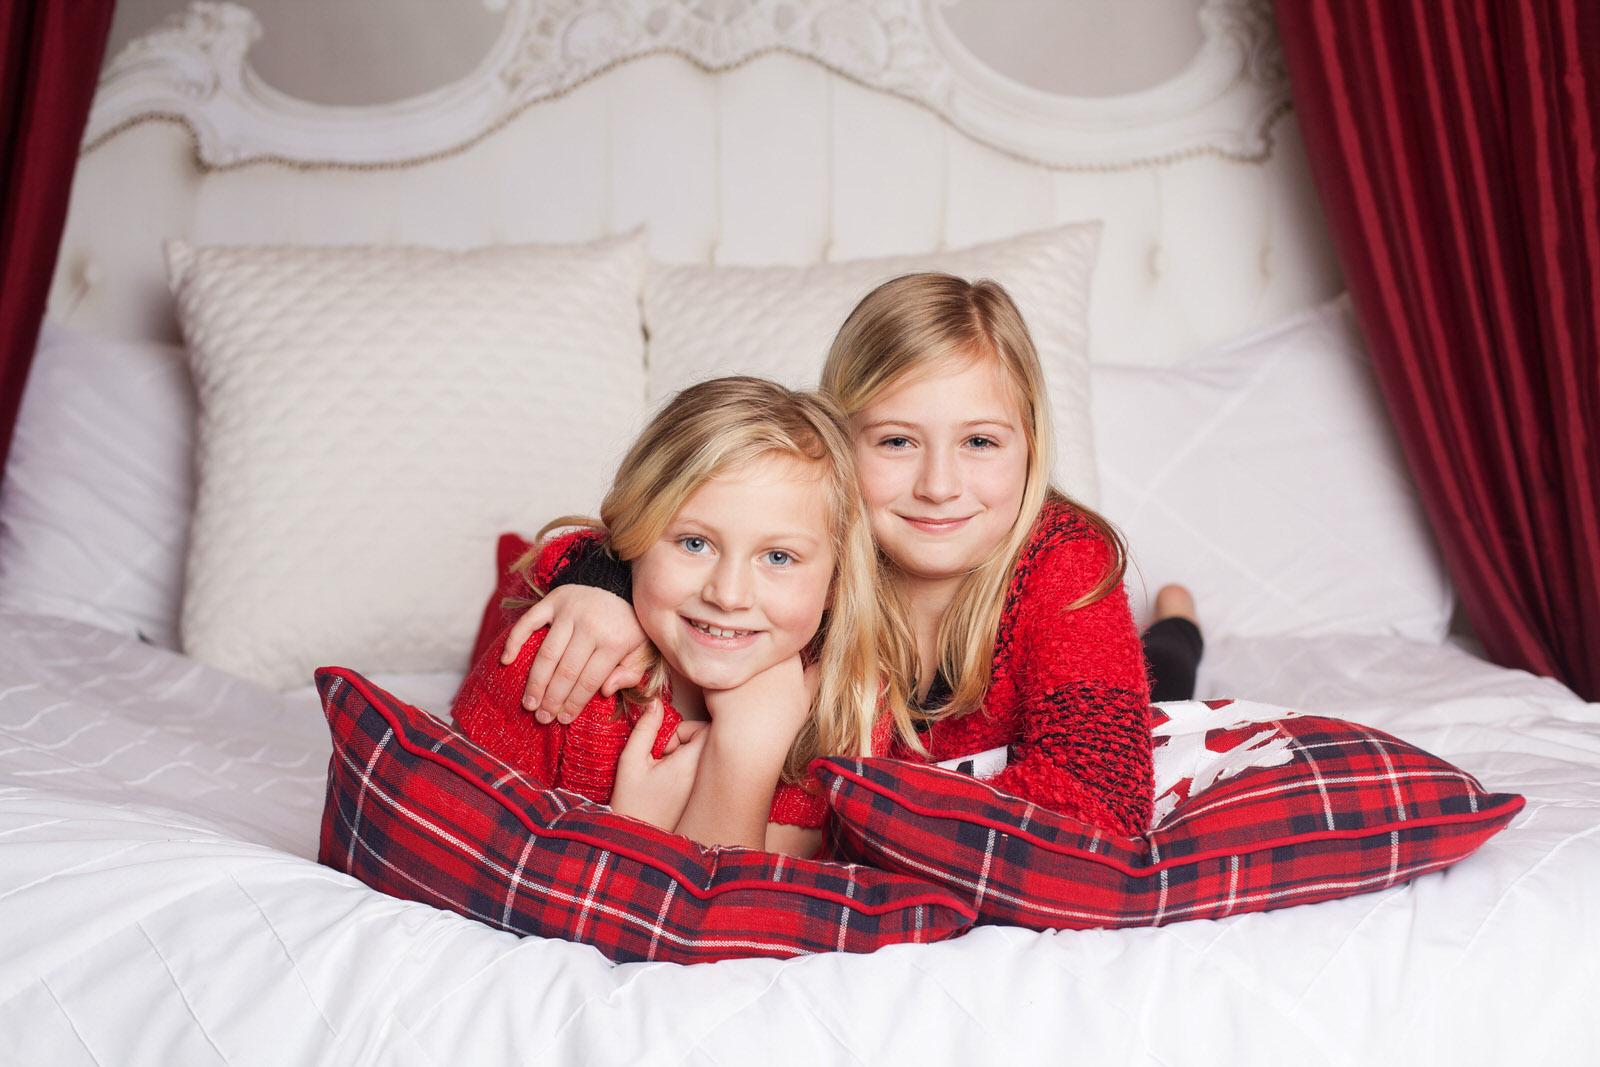 upper-peninsula-photographer-family-children-marquette-michigan-jackie-solomon-008.jpg